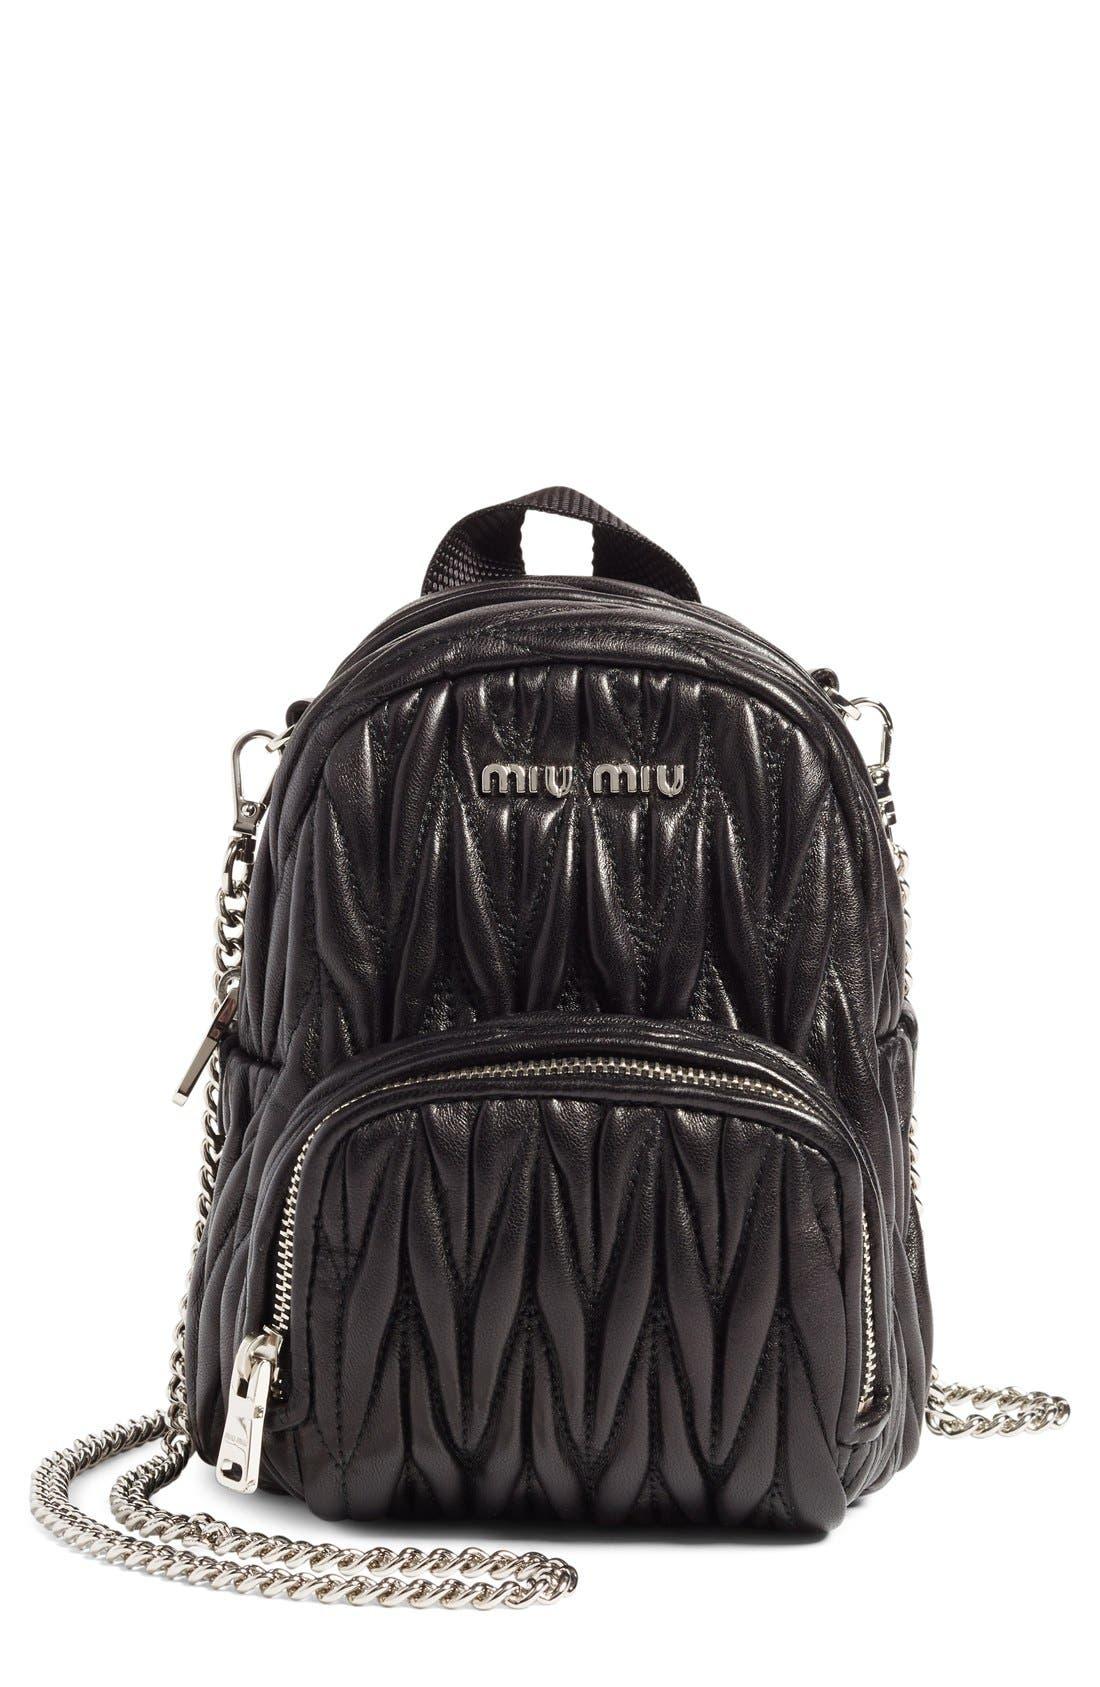 Micro Matelassé Leather Backpack,                             Main thumbnail 1, color,                             001